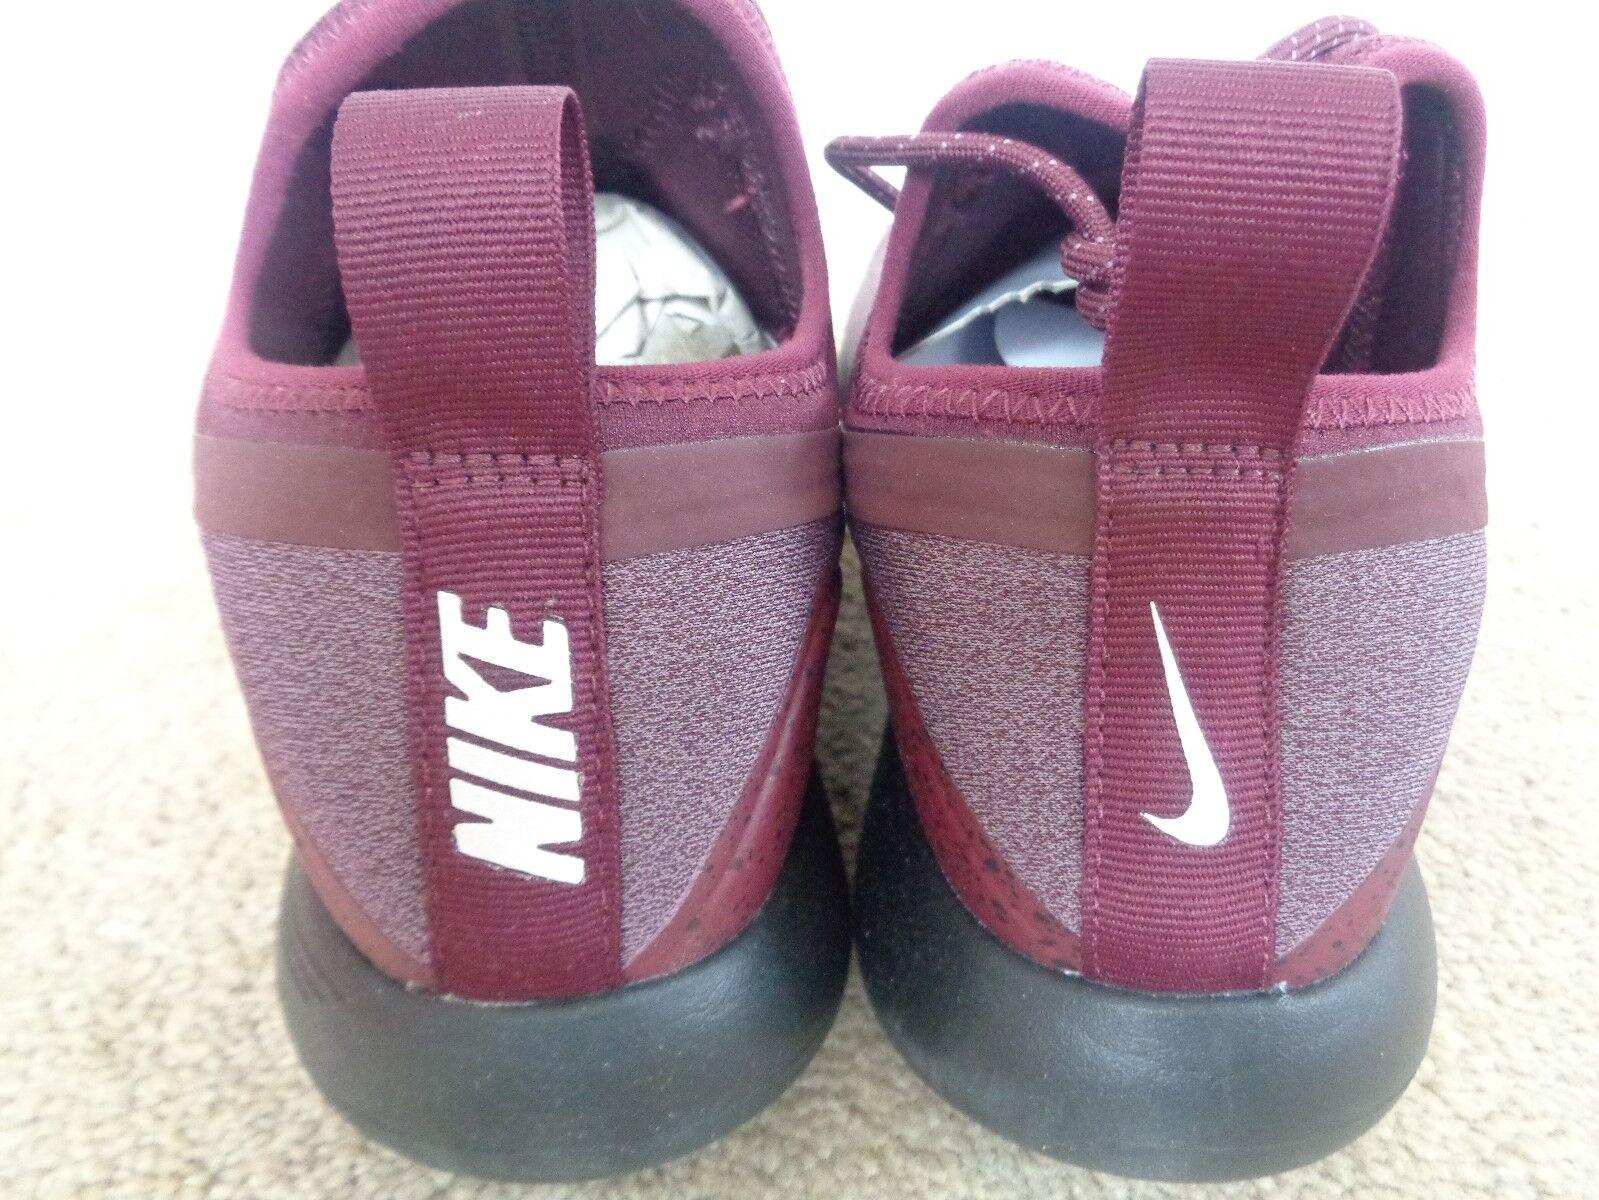 Nike lunarcharge Essentiel Wmns Baskets 923620 600 8 US 8 600 Neuf + Bo?te b81ada